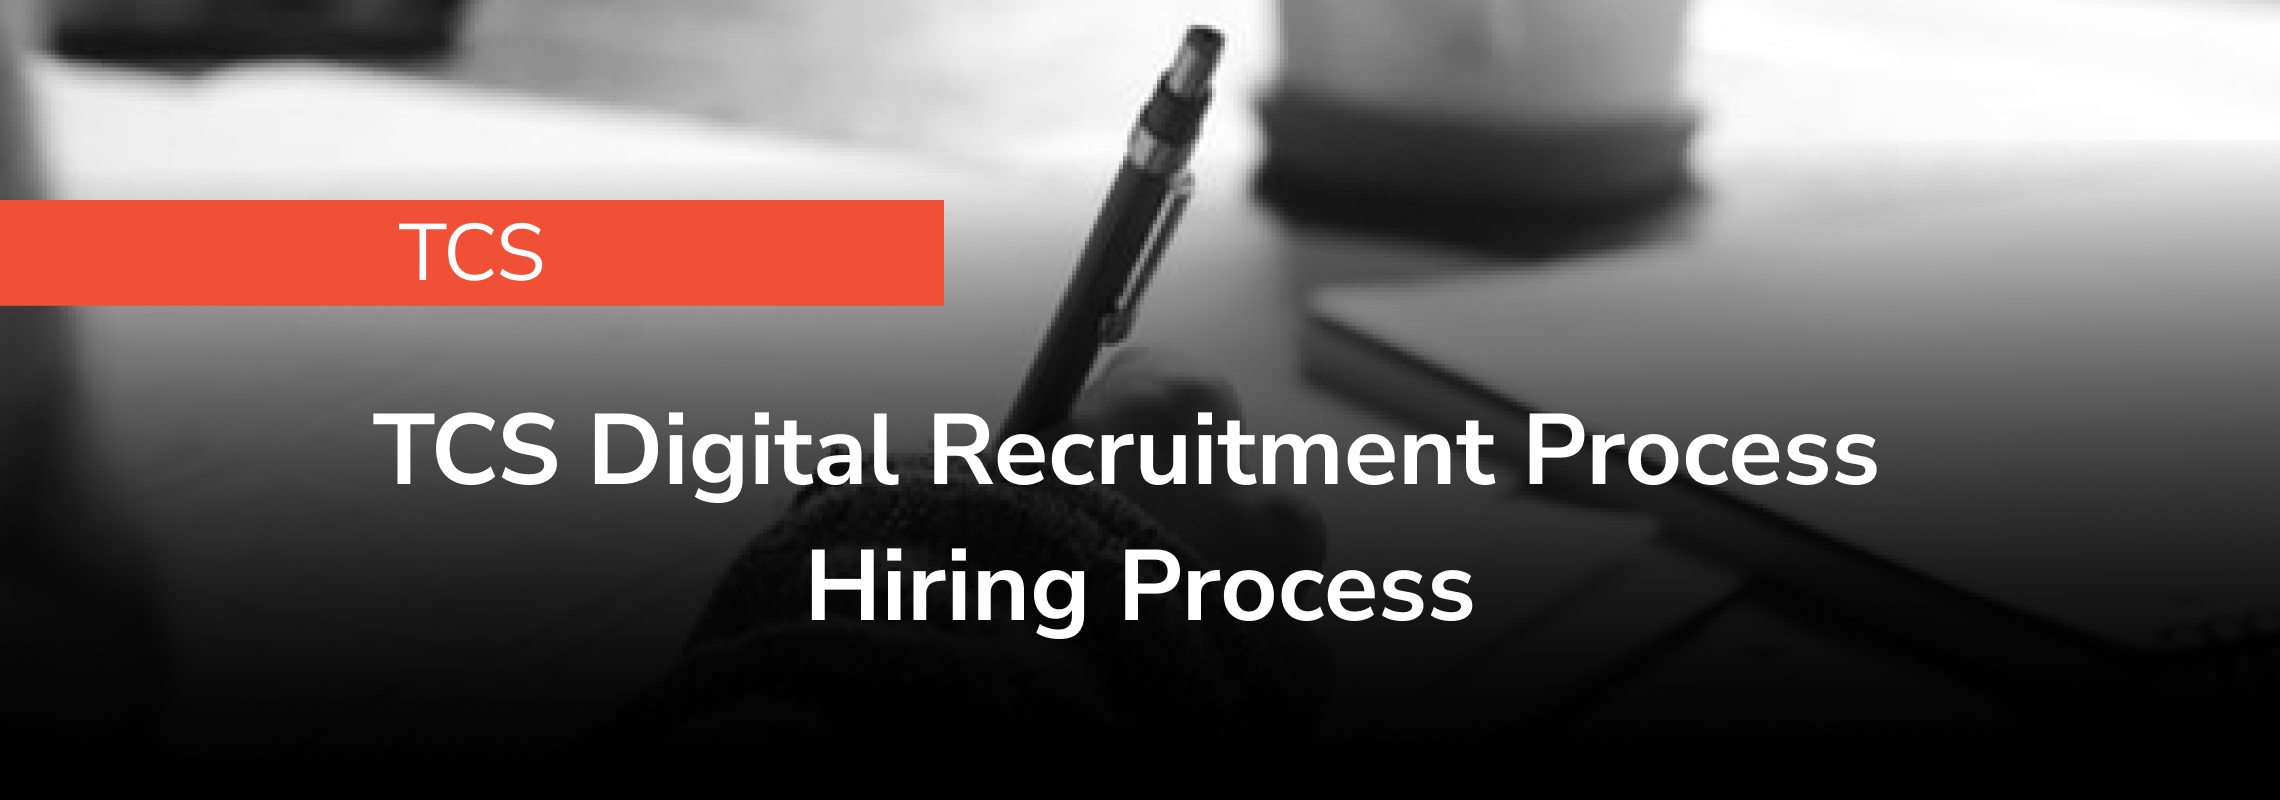 Tcs Digital Recruitment Process Hiring Process